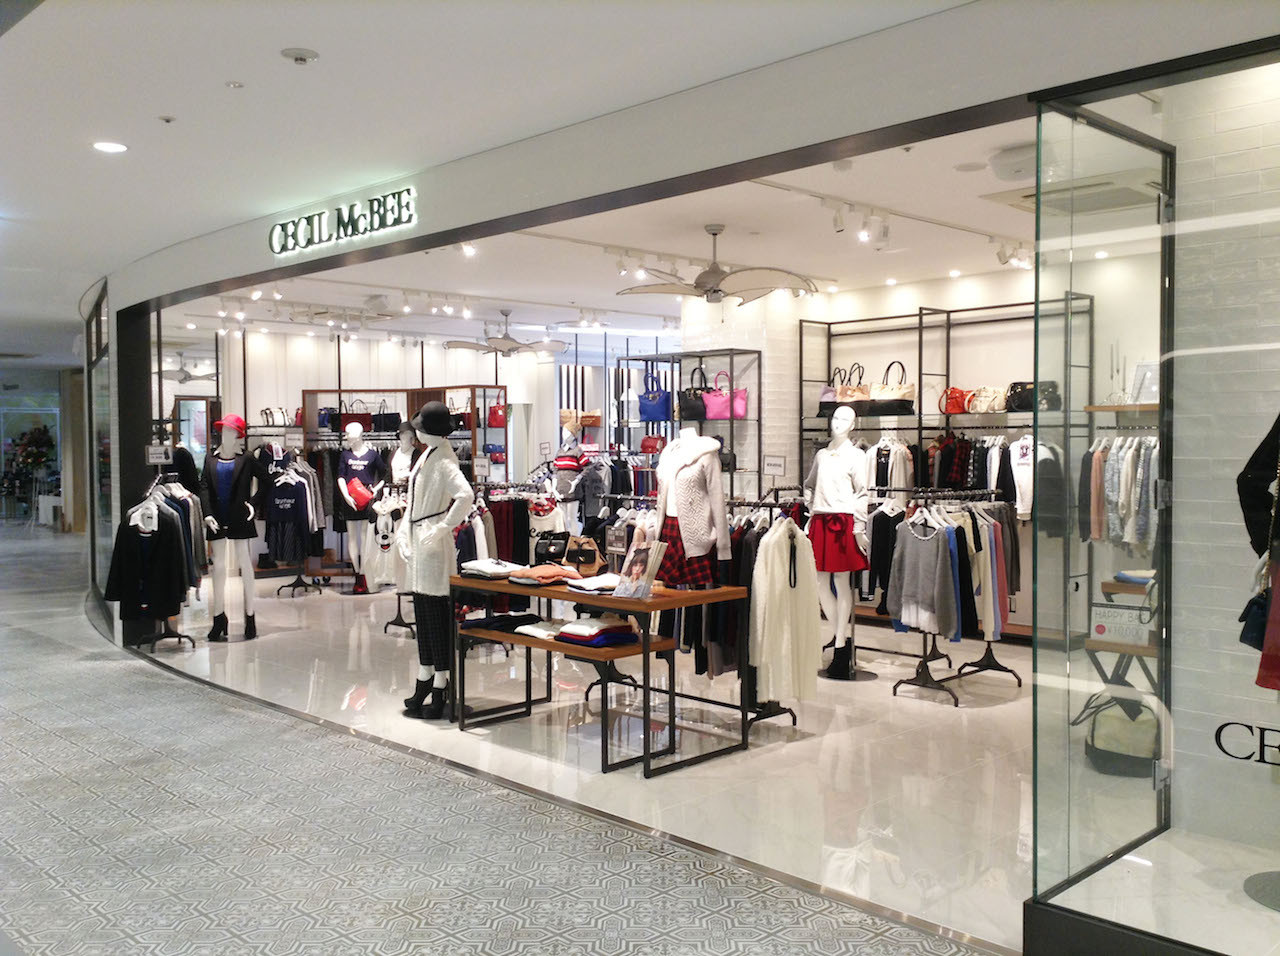 CECILMcBEE 渋谷109鹿児島店様【新装/施工】